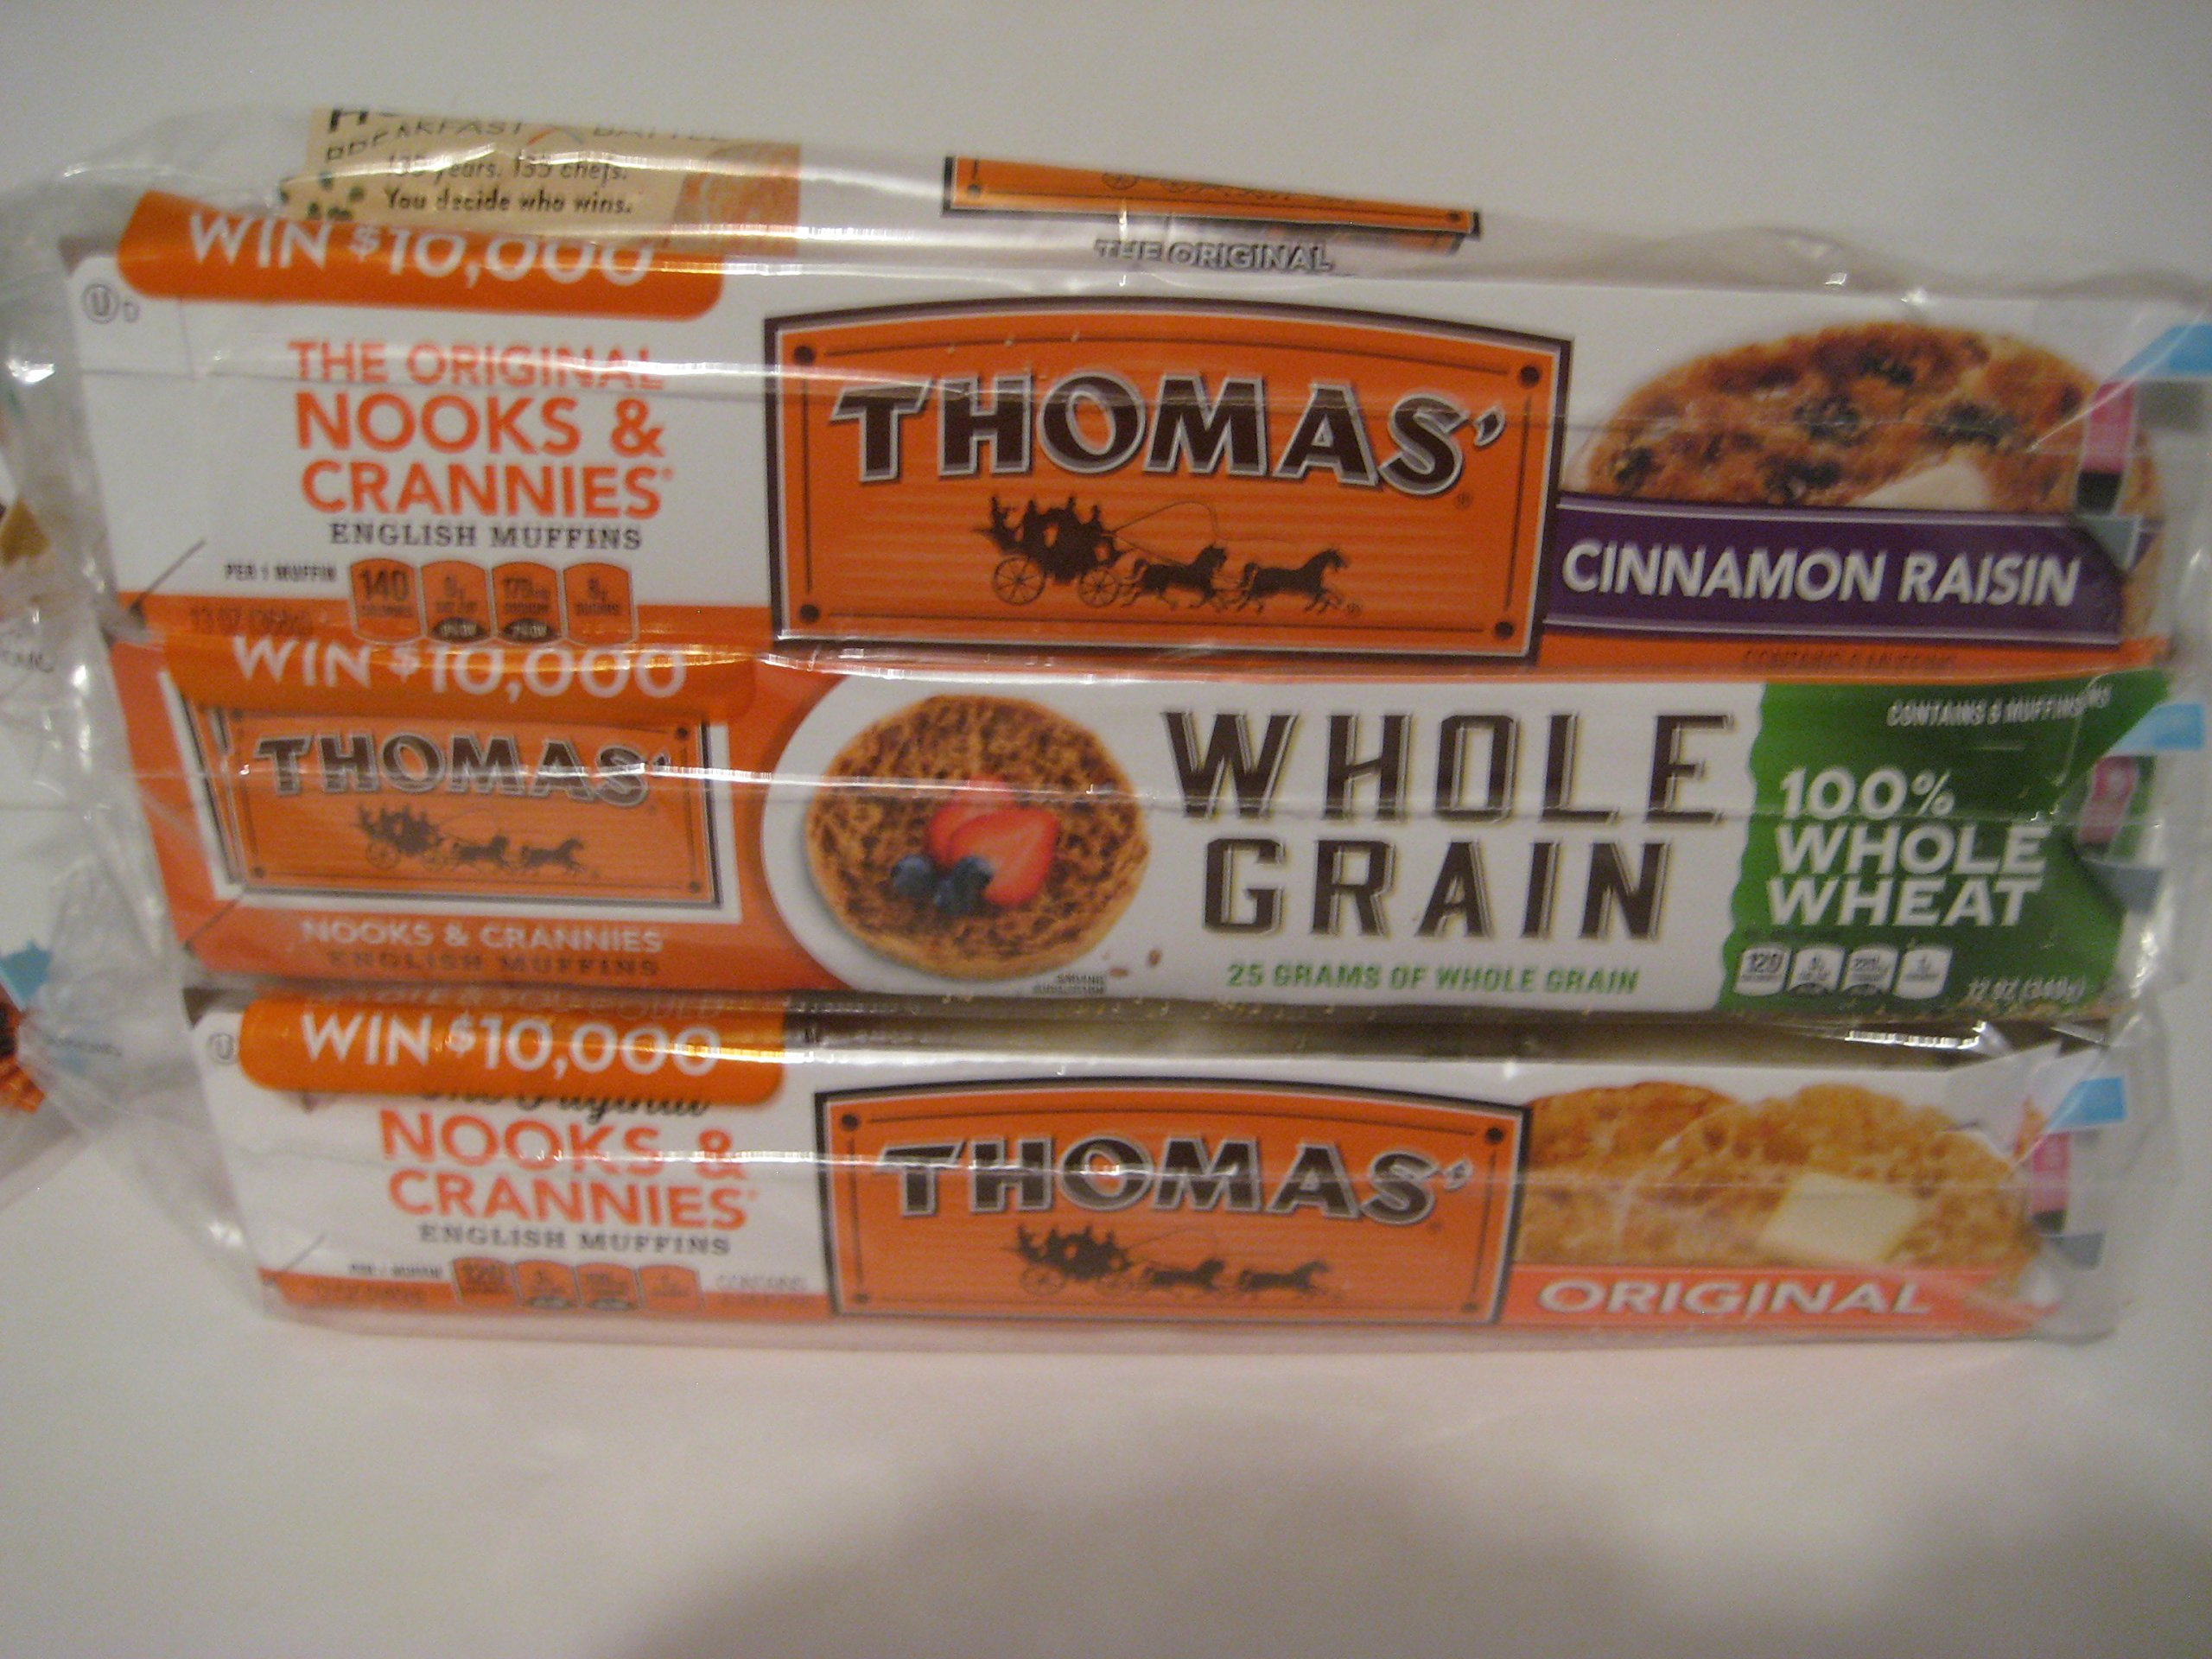 Thomas' English Muffin Combo: Original Nooks & Crannies 6 Ct, Whole Grain 100% Whole Wheat 6 Ct, Cinnamon Raisin 6 Ct Bundle Enjoy!